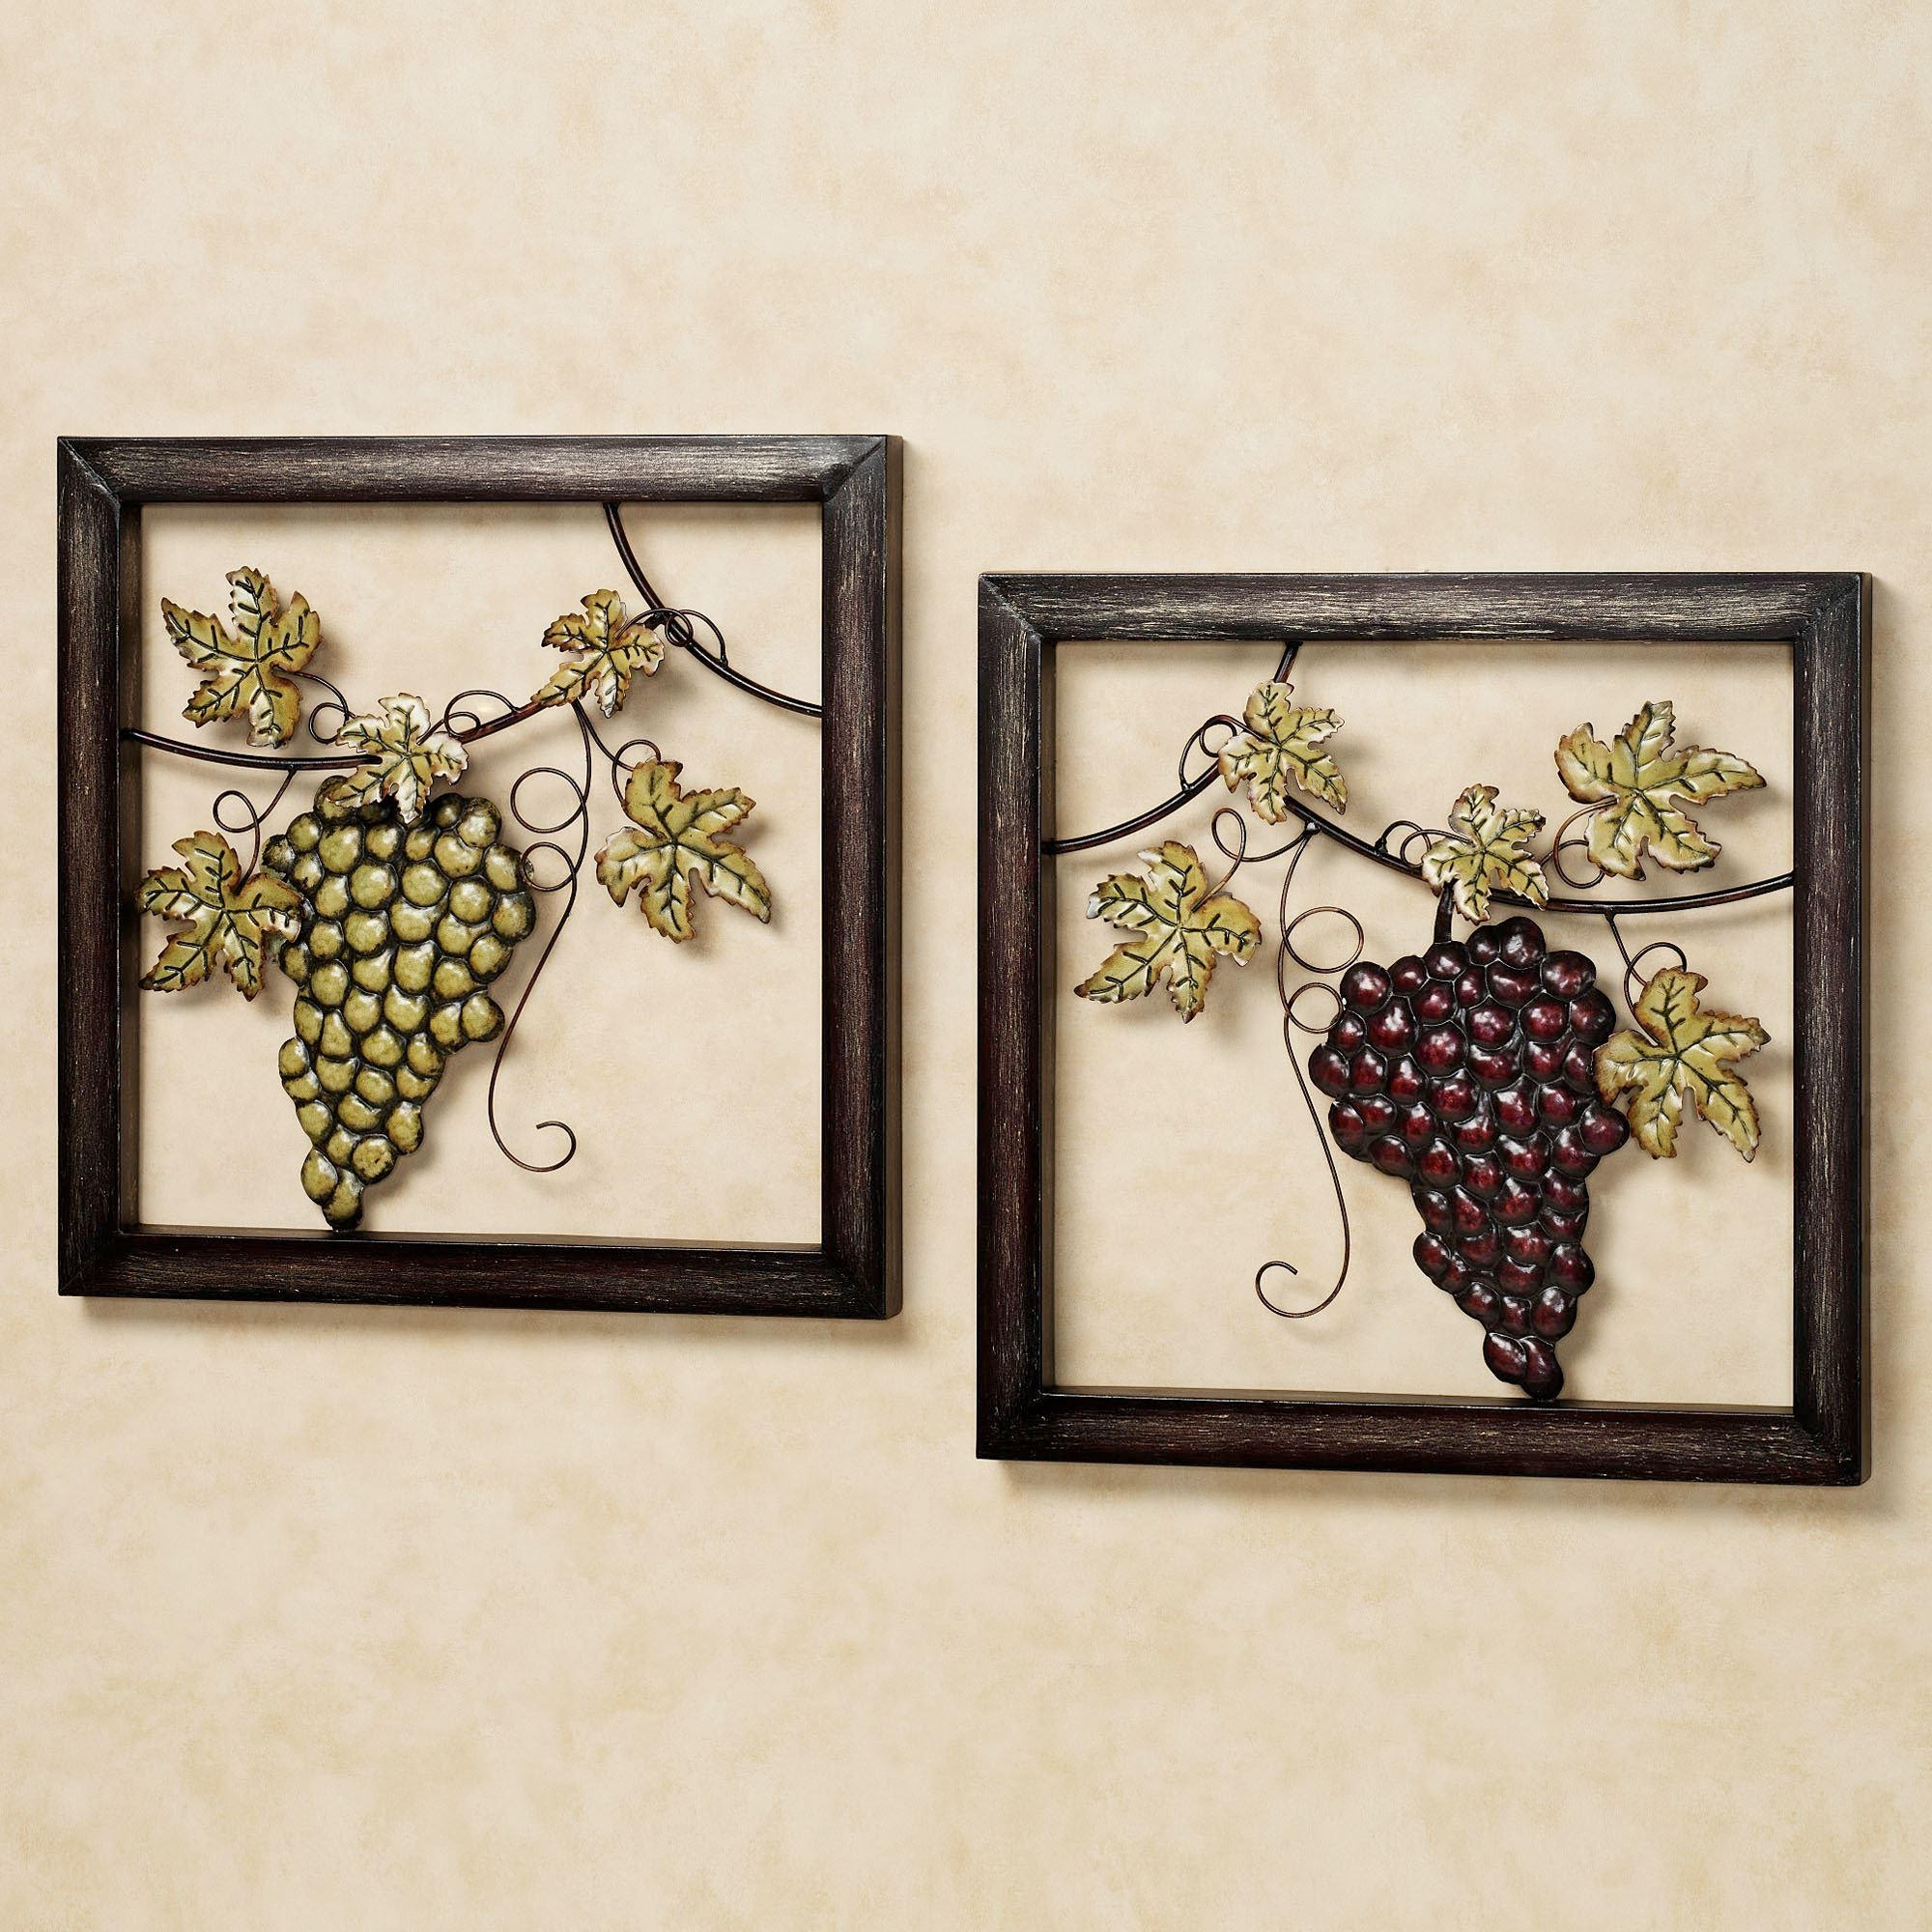 Zspmed Of Wine Wall Art pertaining to Grape Wall Art